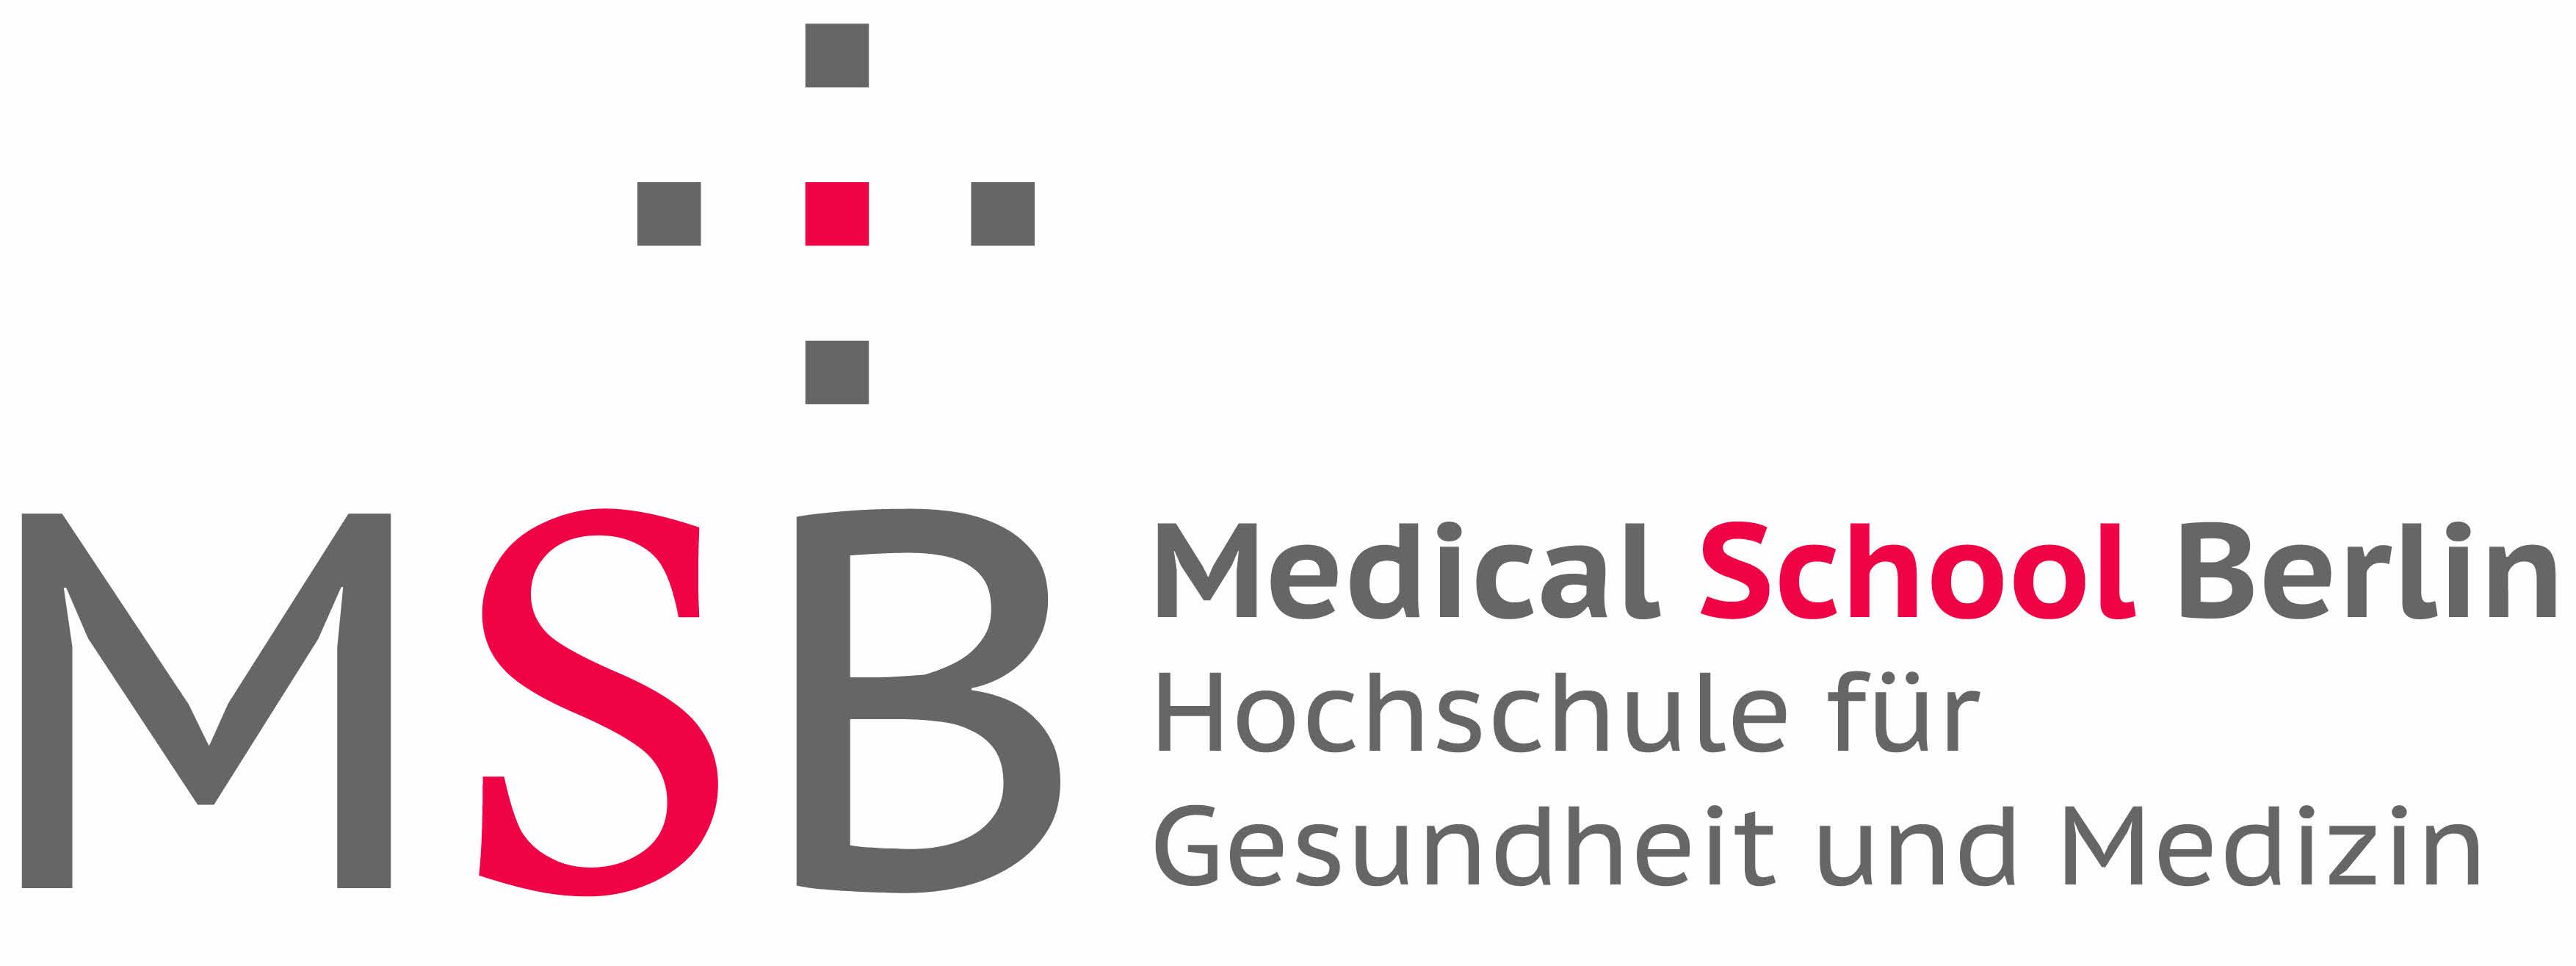 MSB Medical School Berlin